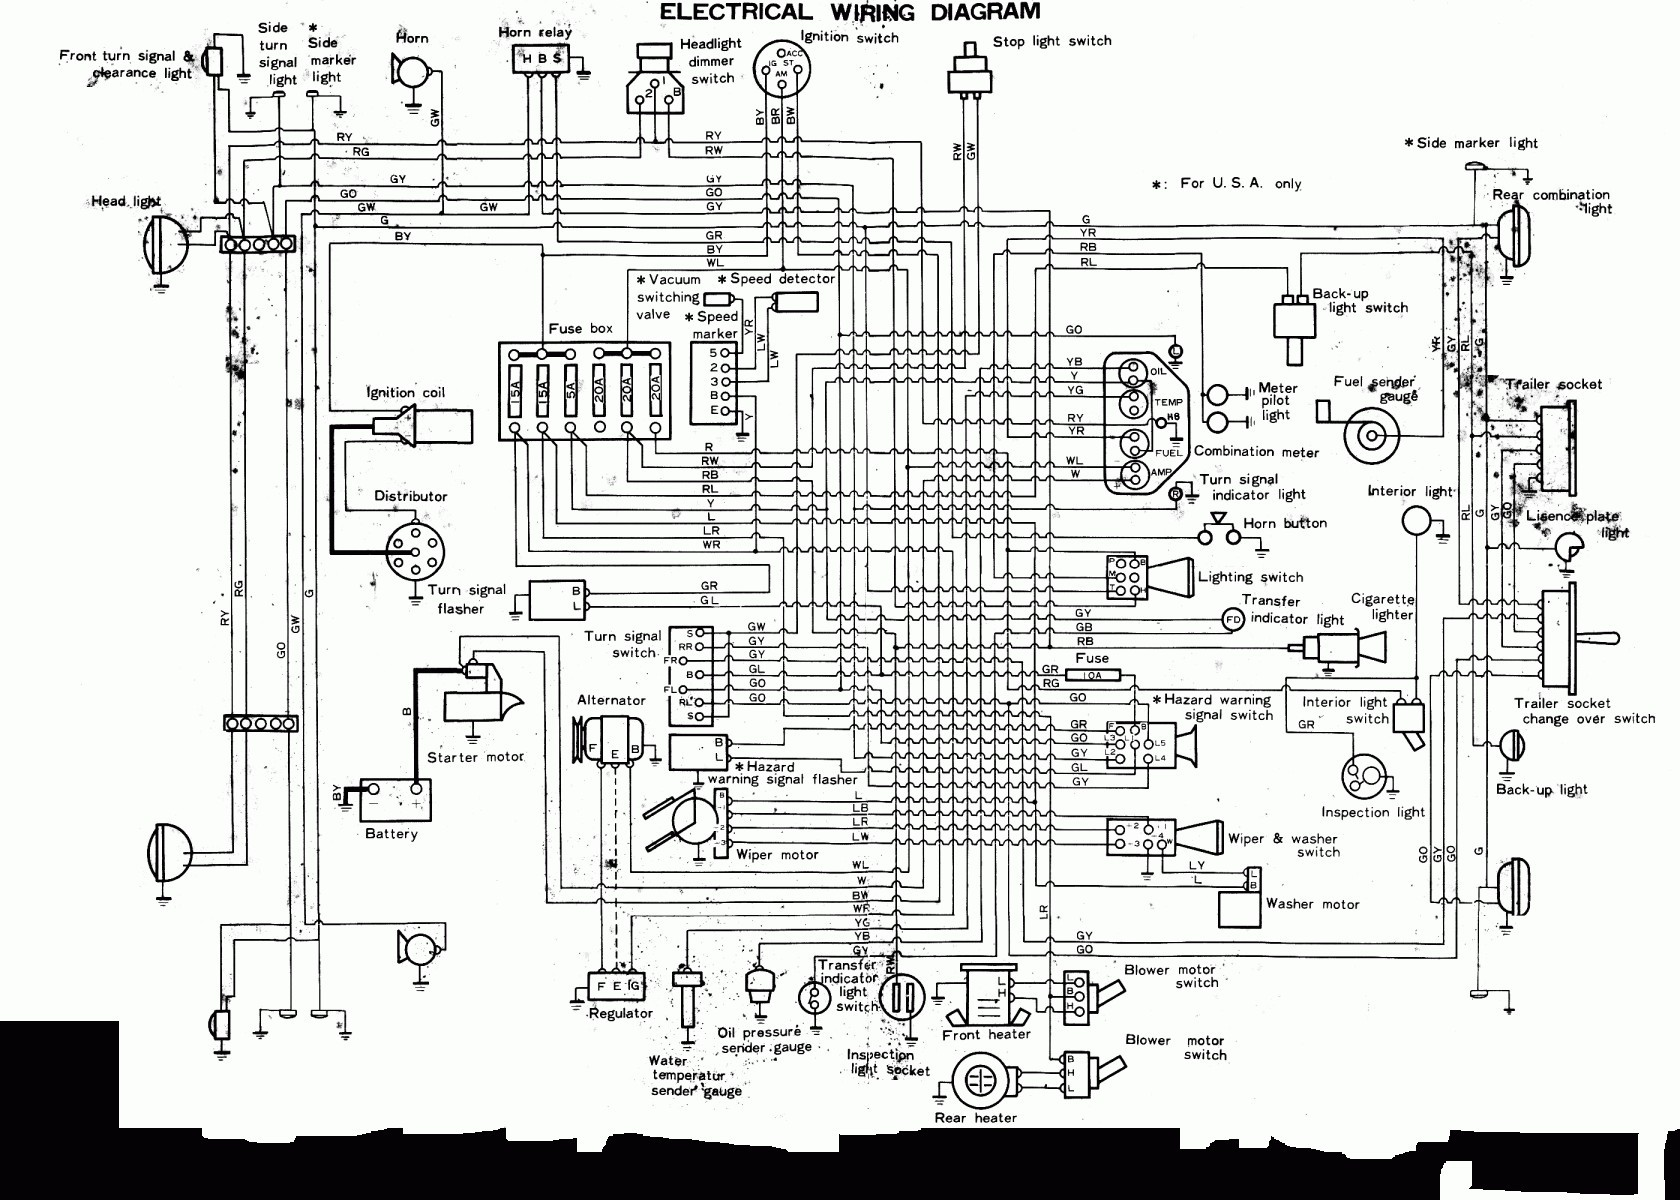 hight resolution of toyota fujitsu ten 86120 wiring diagram wiring diagram image toyota camry radio wiring diagram toyota stereo pin diagram